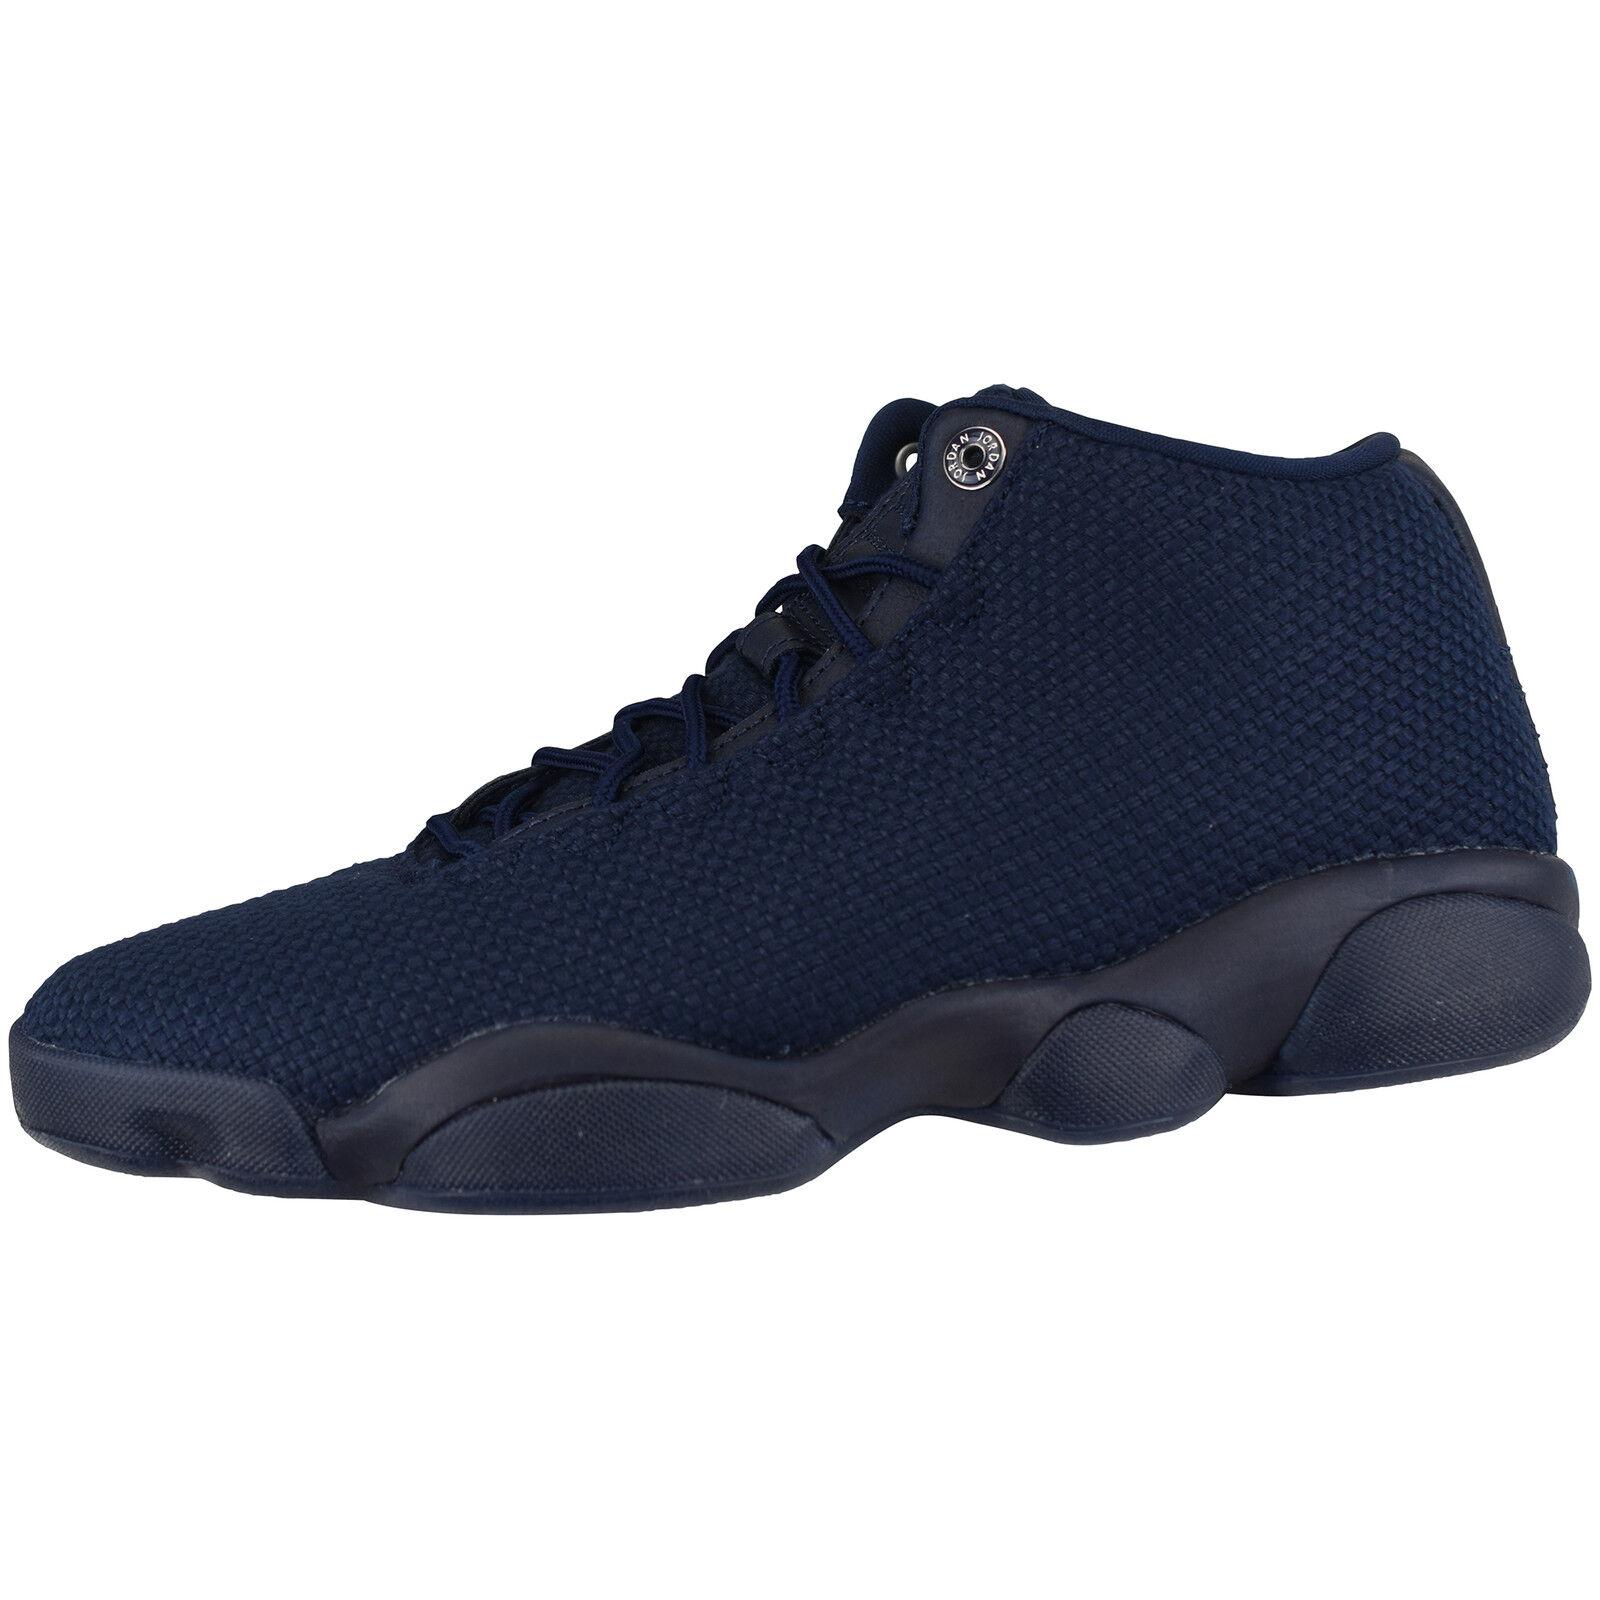 Nike Air Lifestyle Jordan Horizon low 845098400 baloncesto Lifestyle Air cuero zapato cortos 9593f9